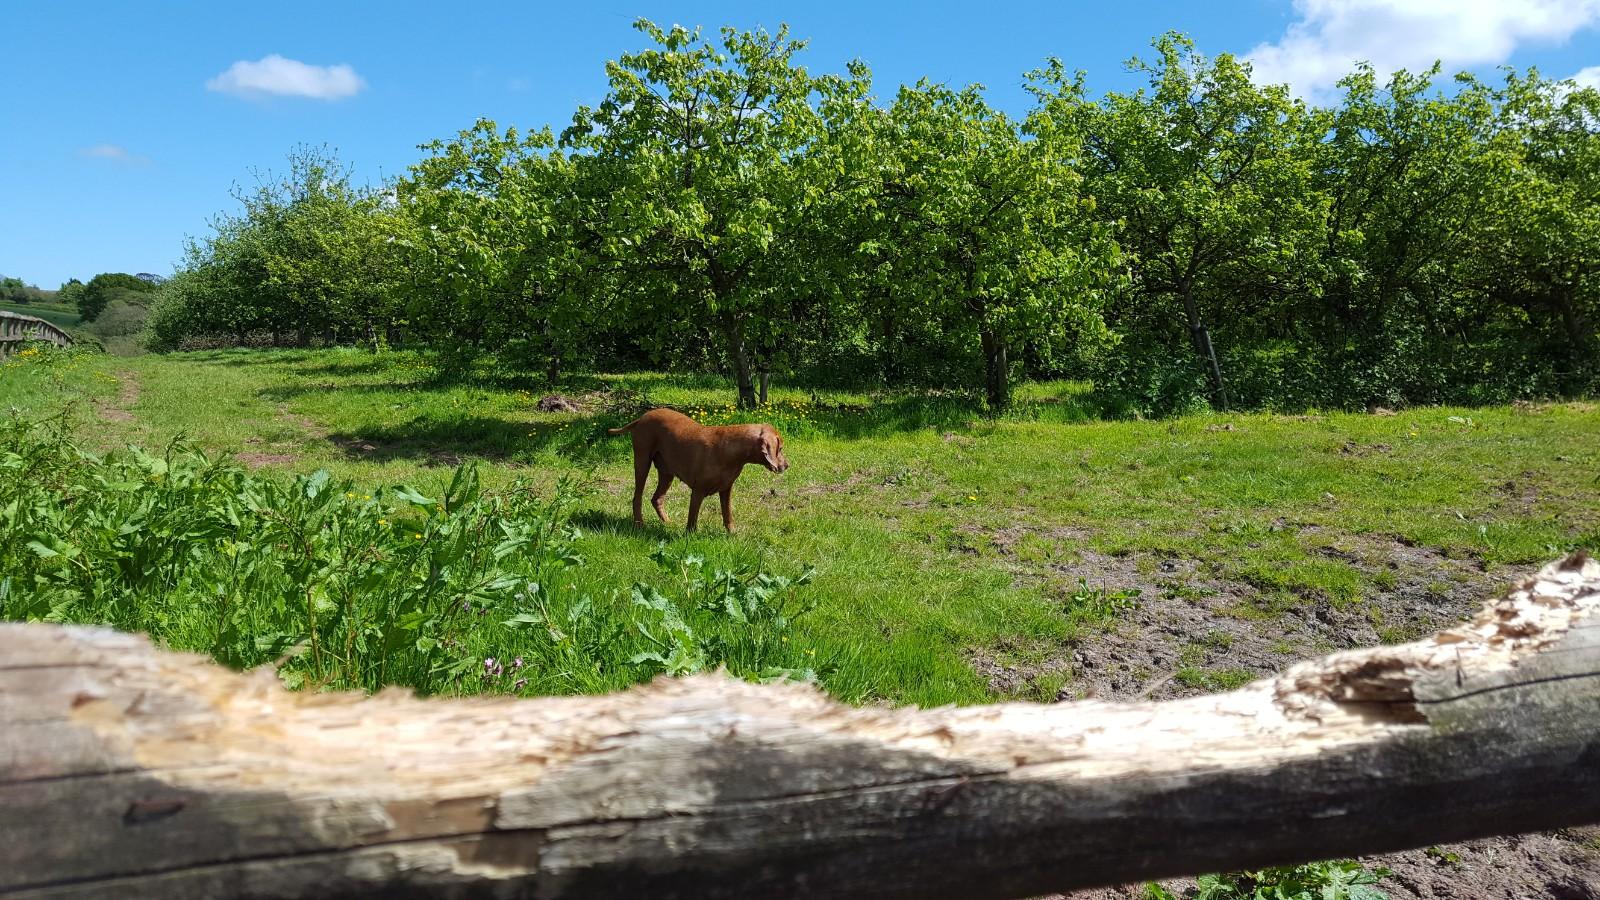 Cider orchard at Solland Farm, Sampford Courtenay, Devon